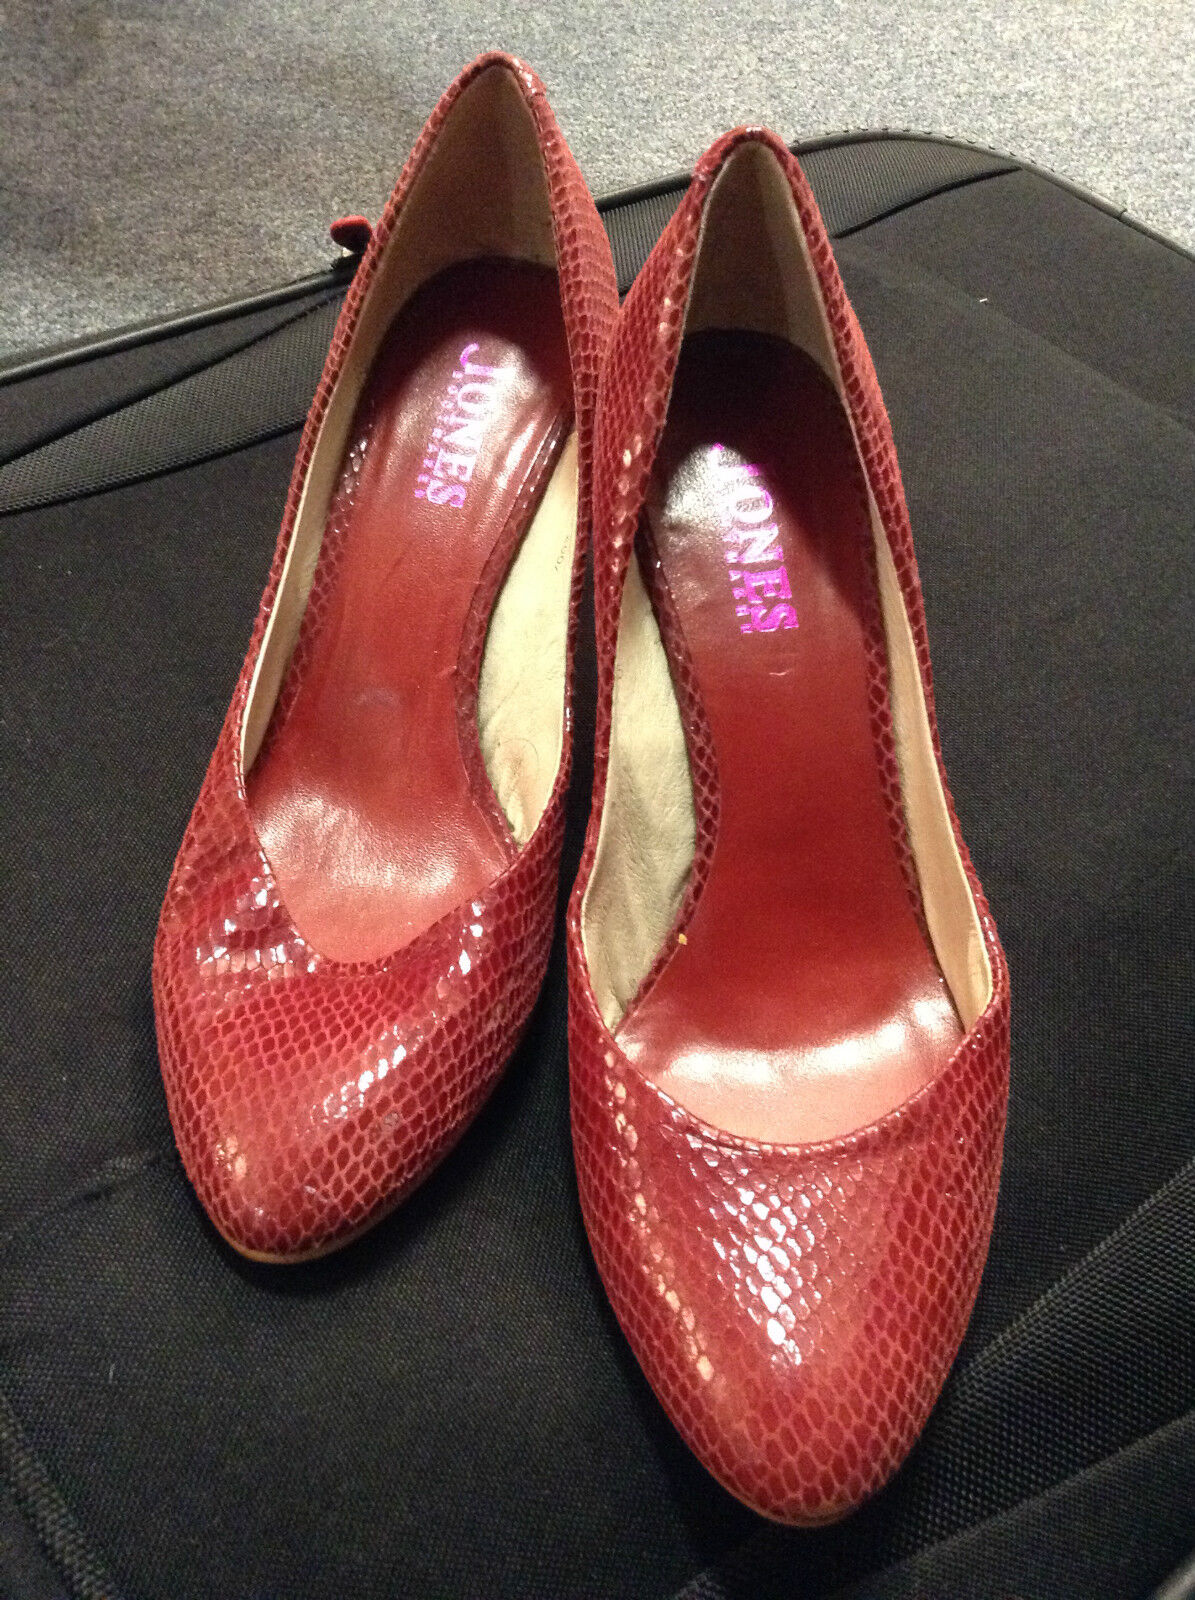 Jones Bootmaker serpente Crimson Red Pelle di serpente Bootmaker di TIMIDA Décolleté tutti in Pelle EU 37 99c538